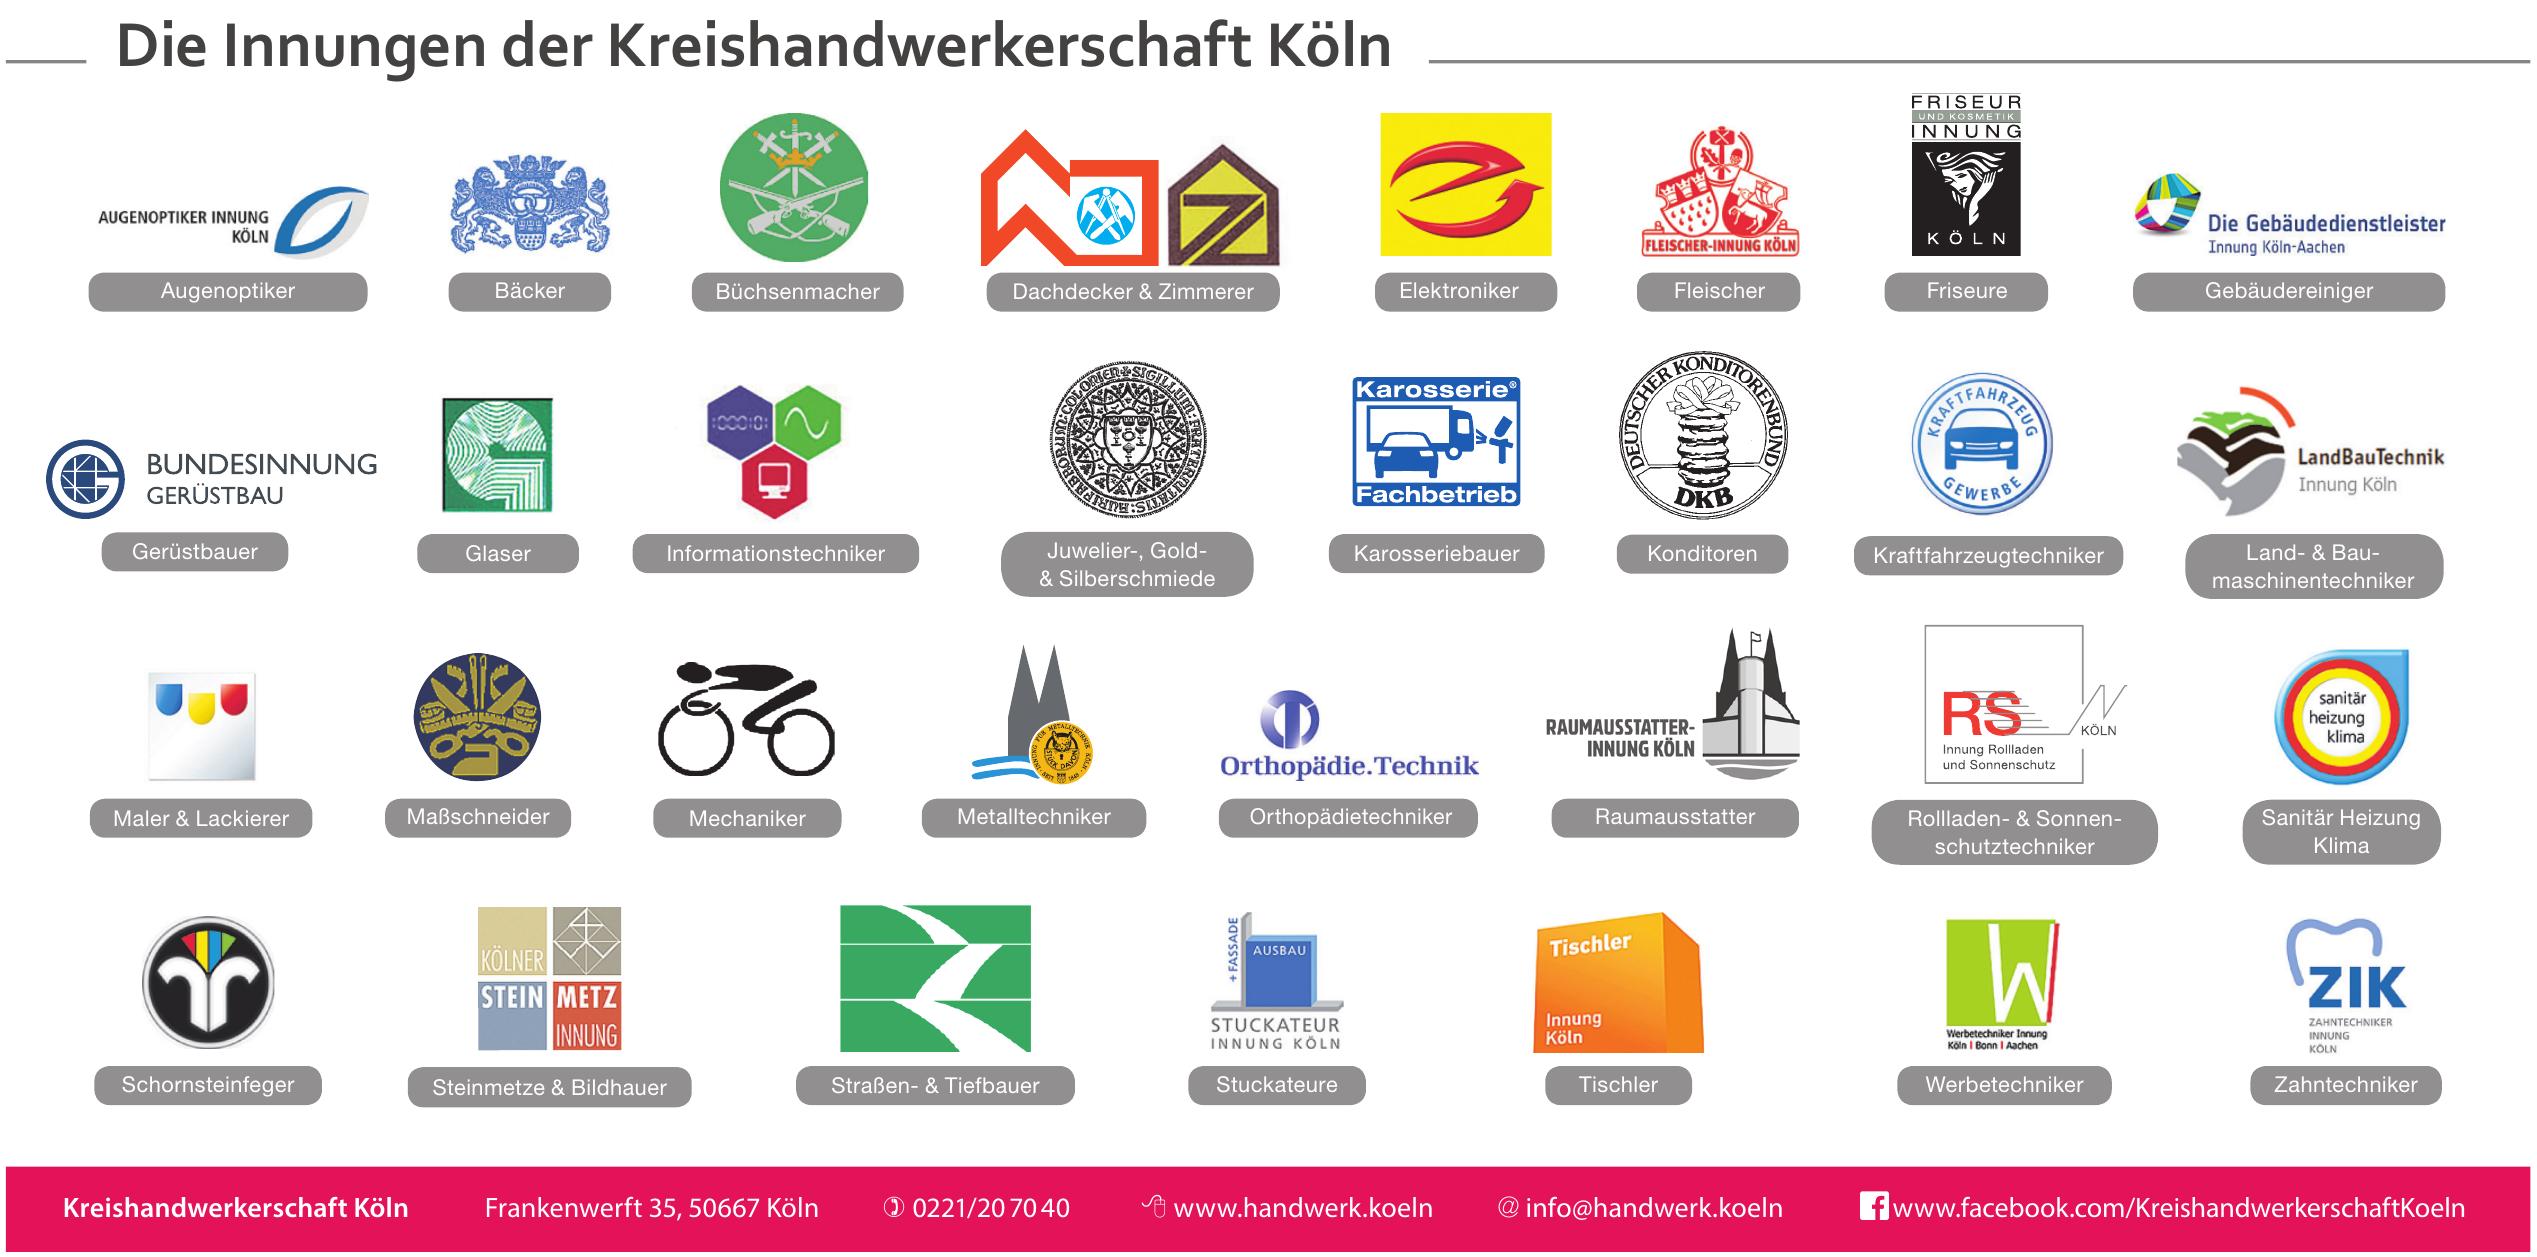 Kreishandwerkerschaft Köln